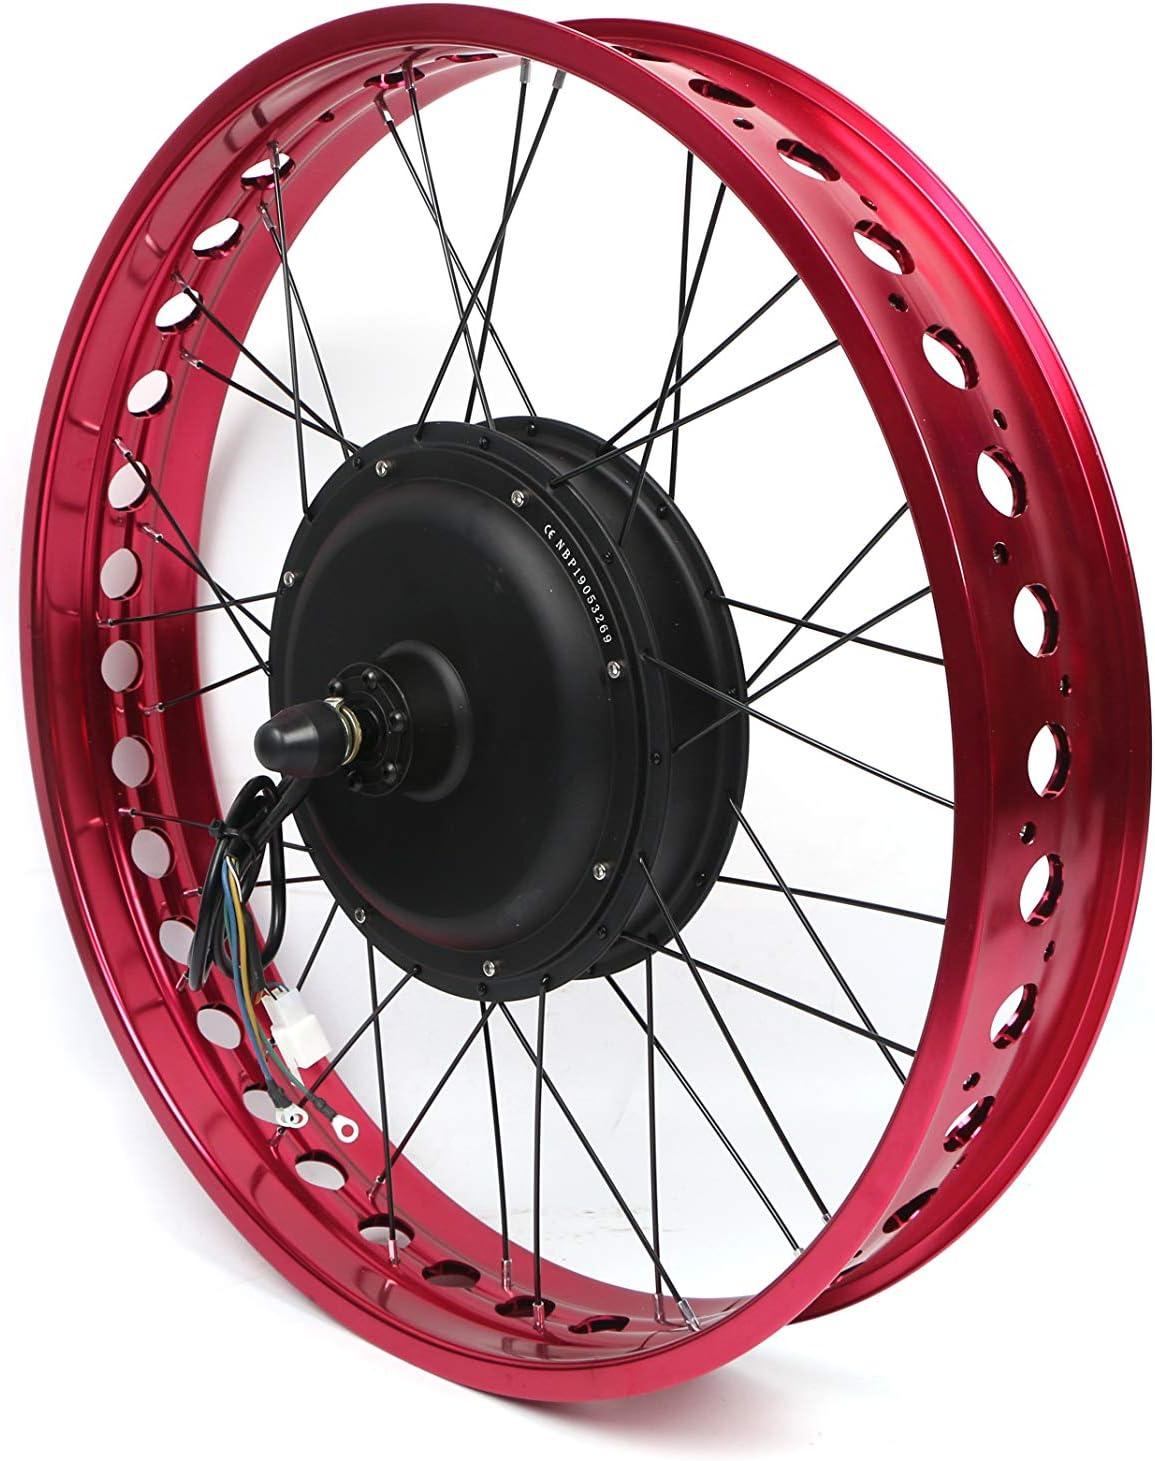 NBpower New product!! 48V 52V 1500W Rear Wheel online shopping Fat Kitï¼Electric Bike Tire